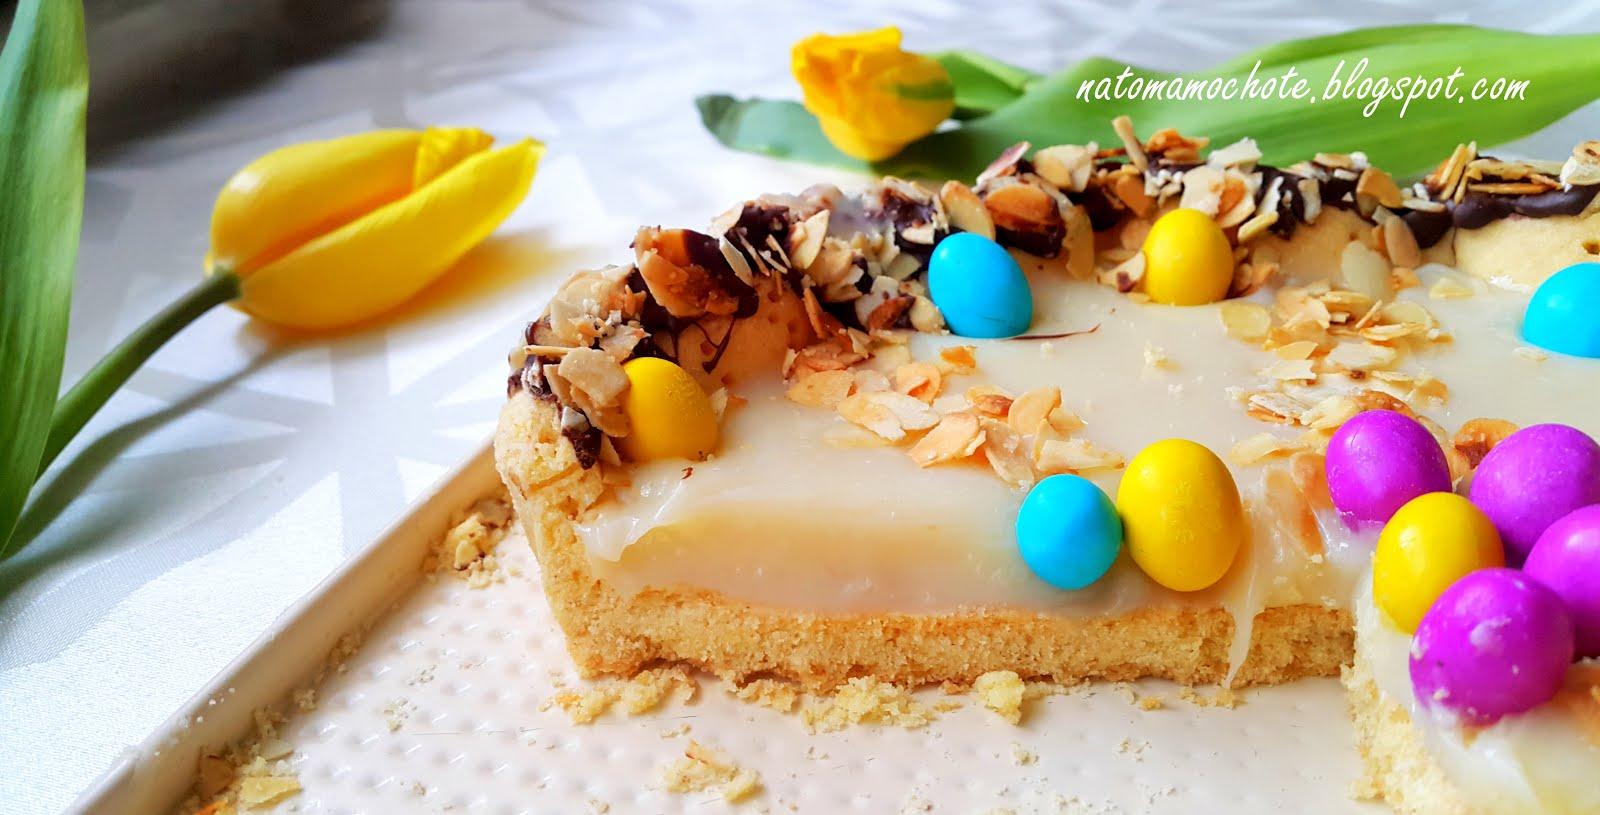 Wielkanocny Mazurek na Mleku Skondensowanym